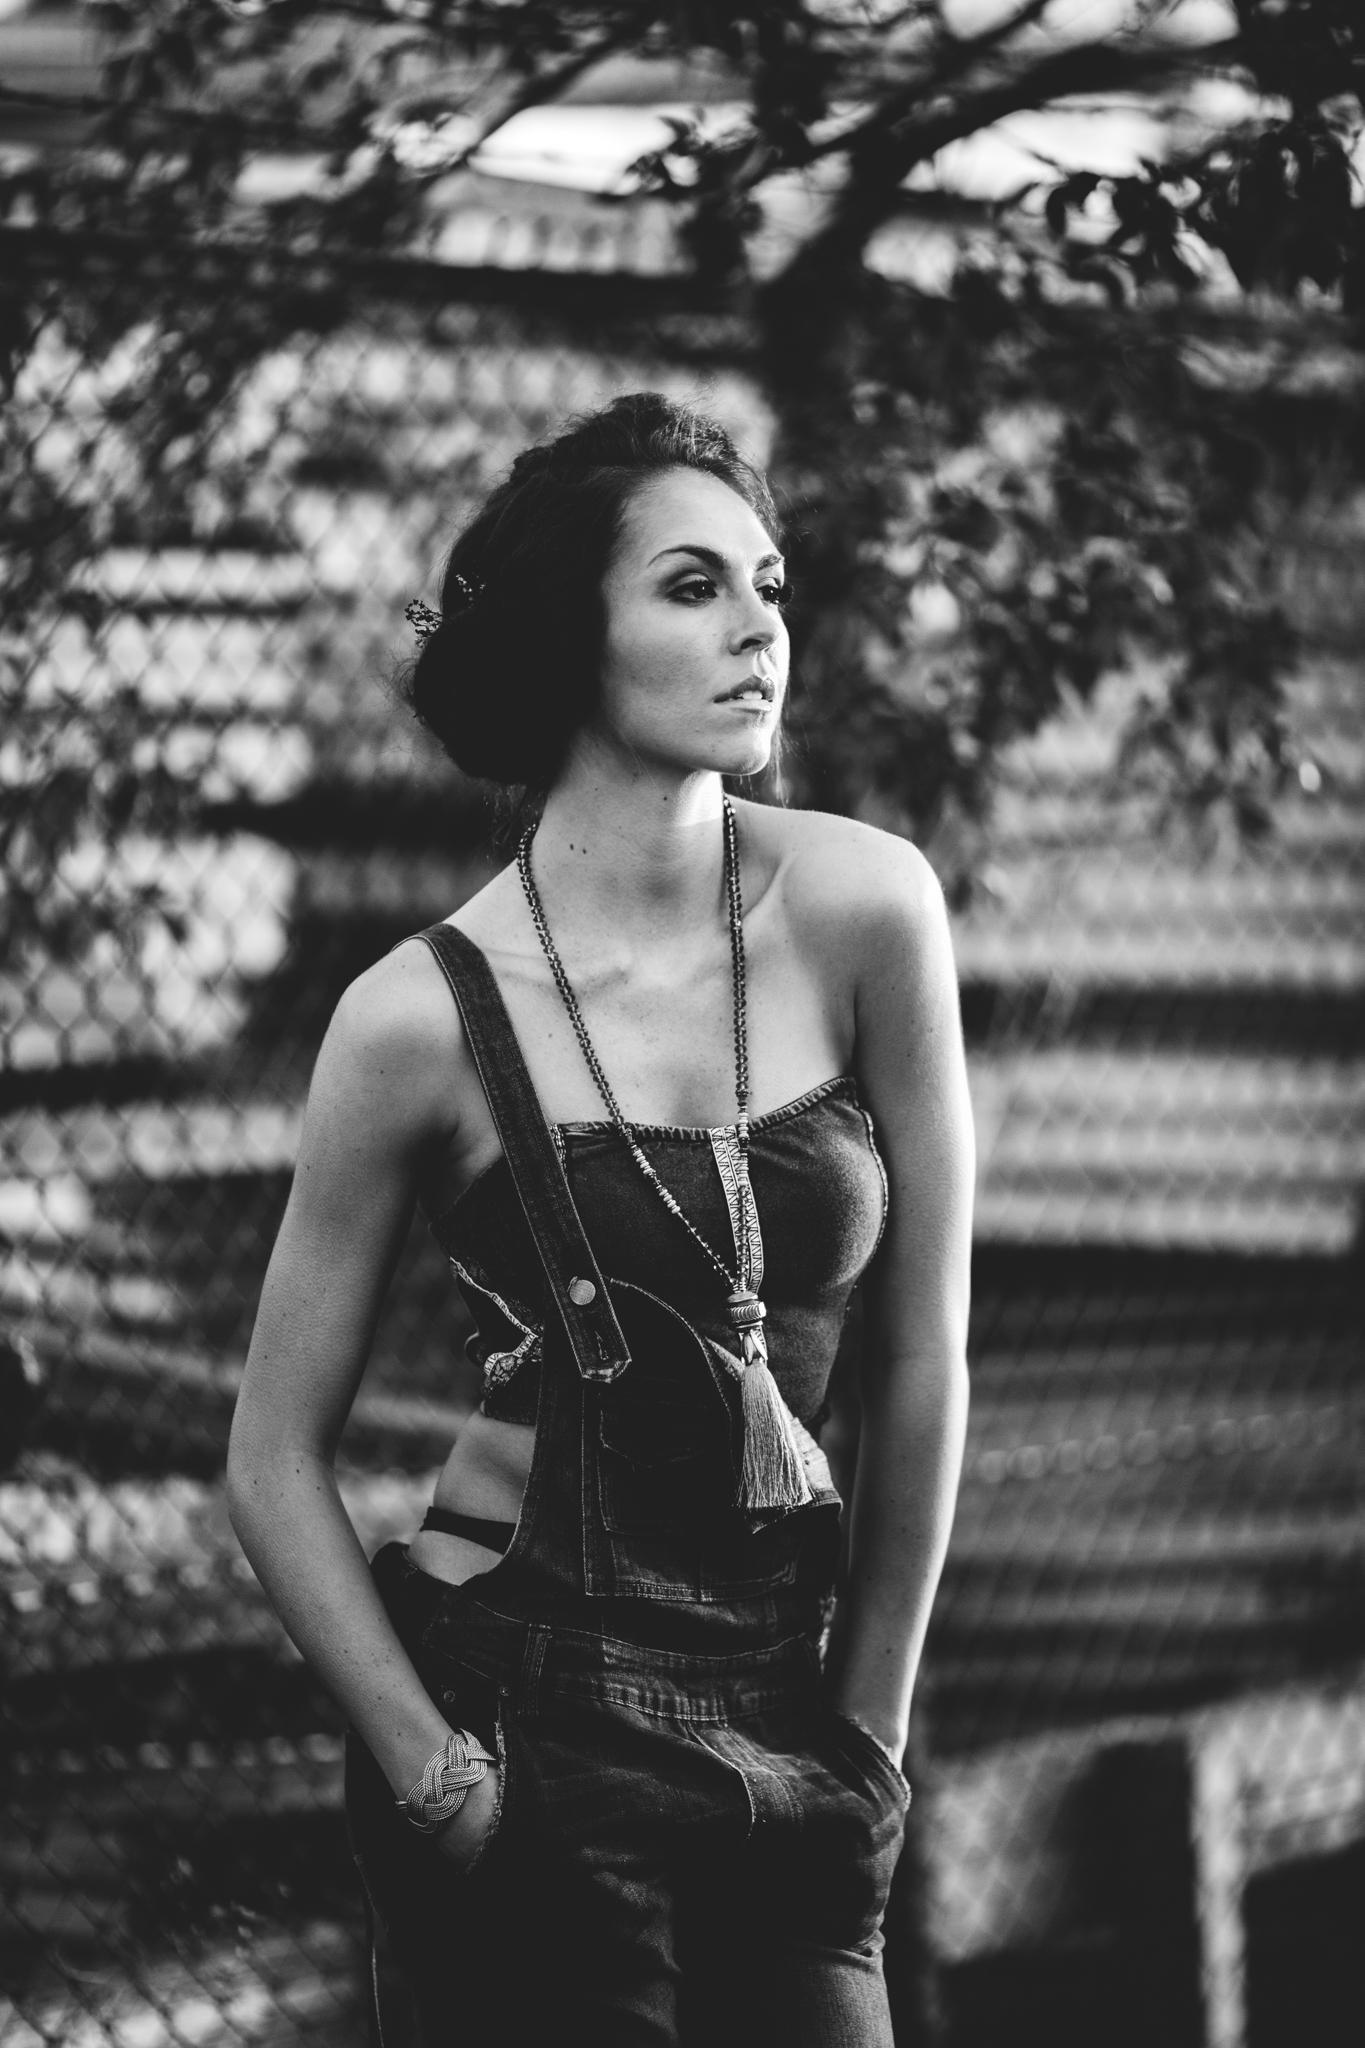 denver fashion photography (41 of 54)